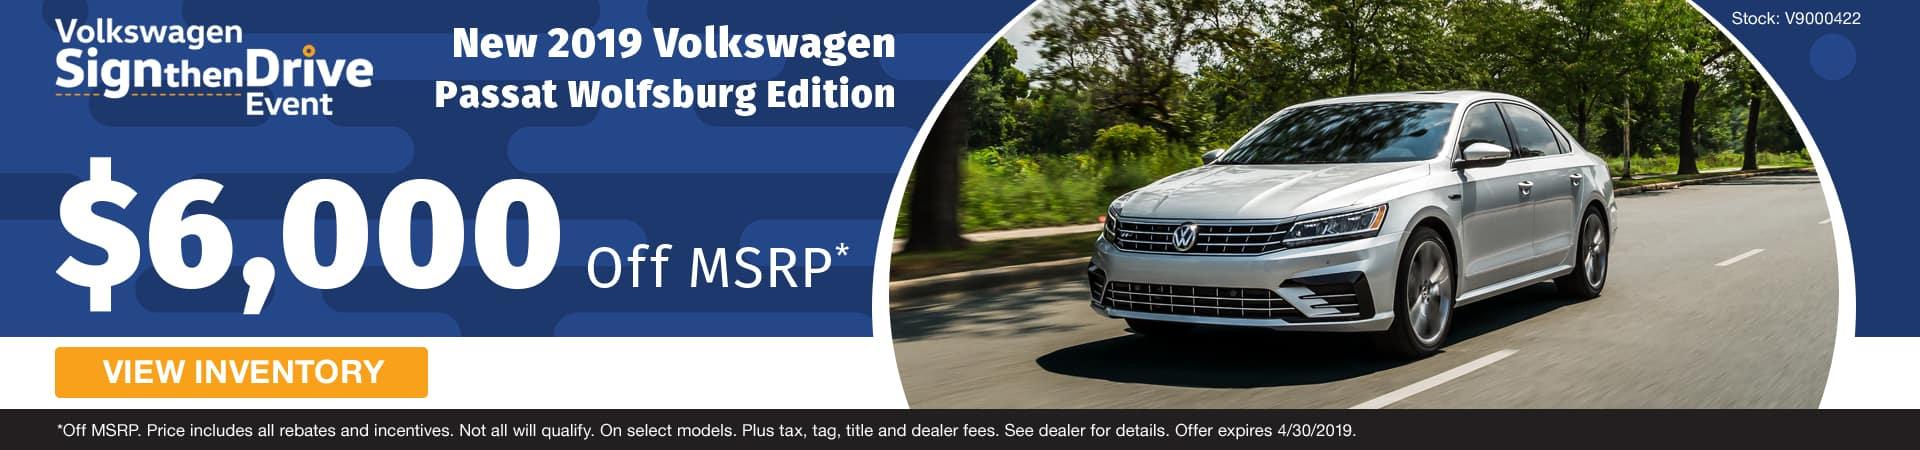 Save $6,000 on a new 2019 Volkswagen Passat Wolfsburg Edition in Murfreesboro TN